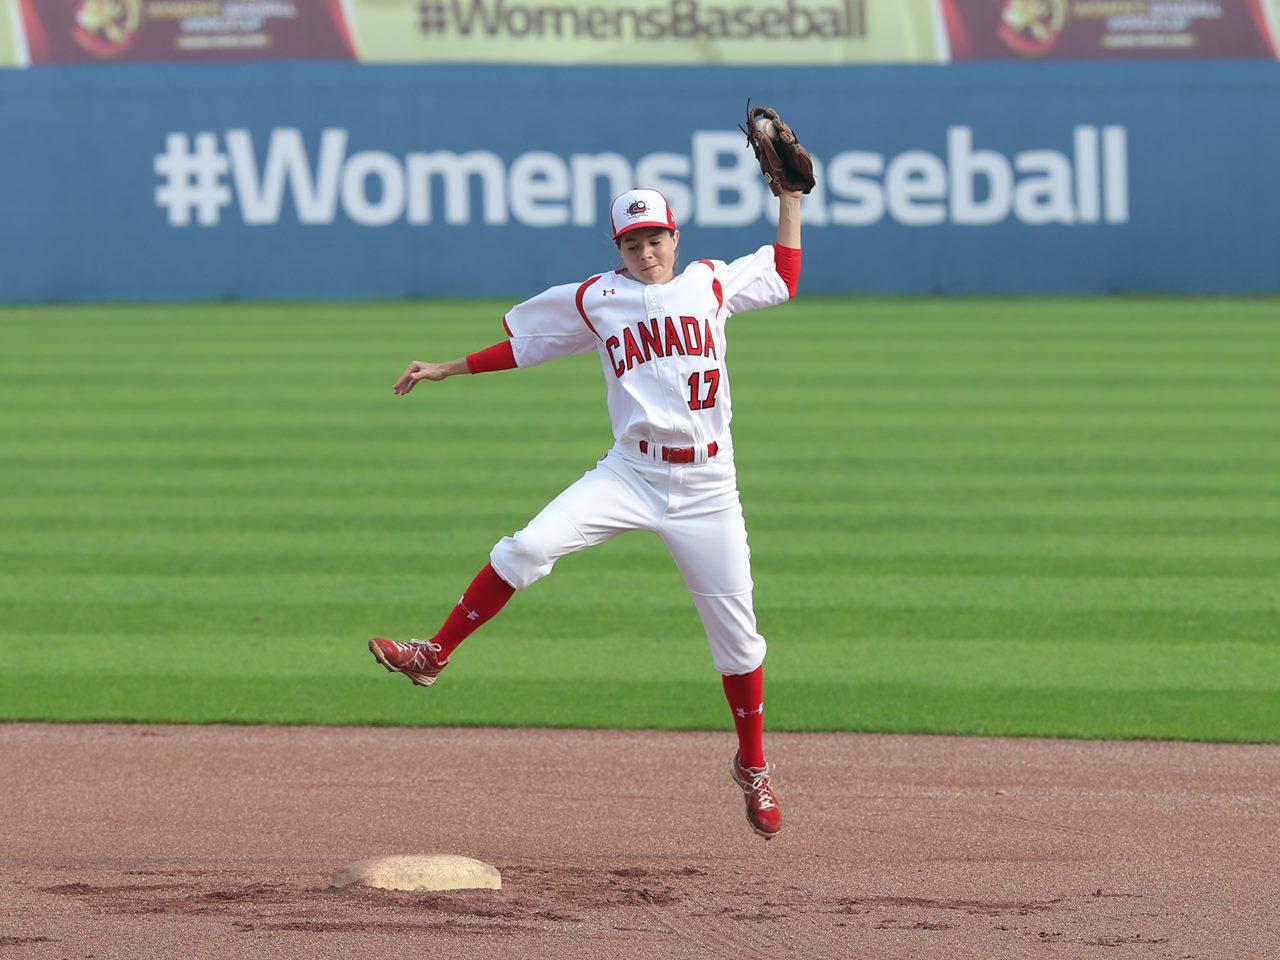 CAN Women's National Team - Baseball World Cup 2016